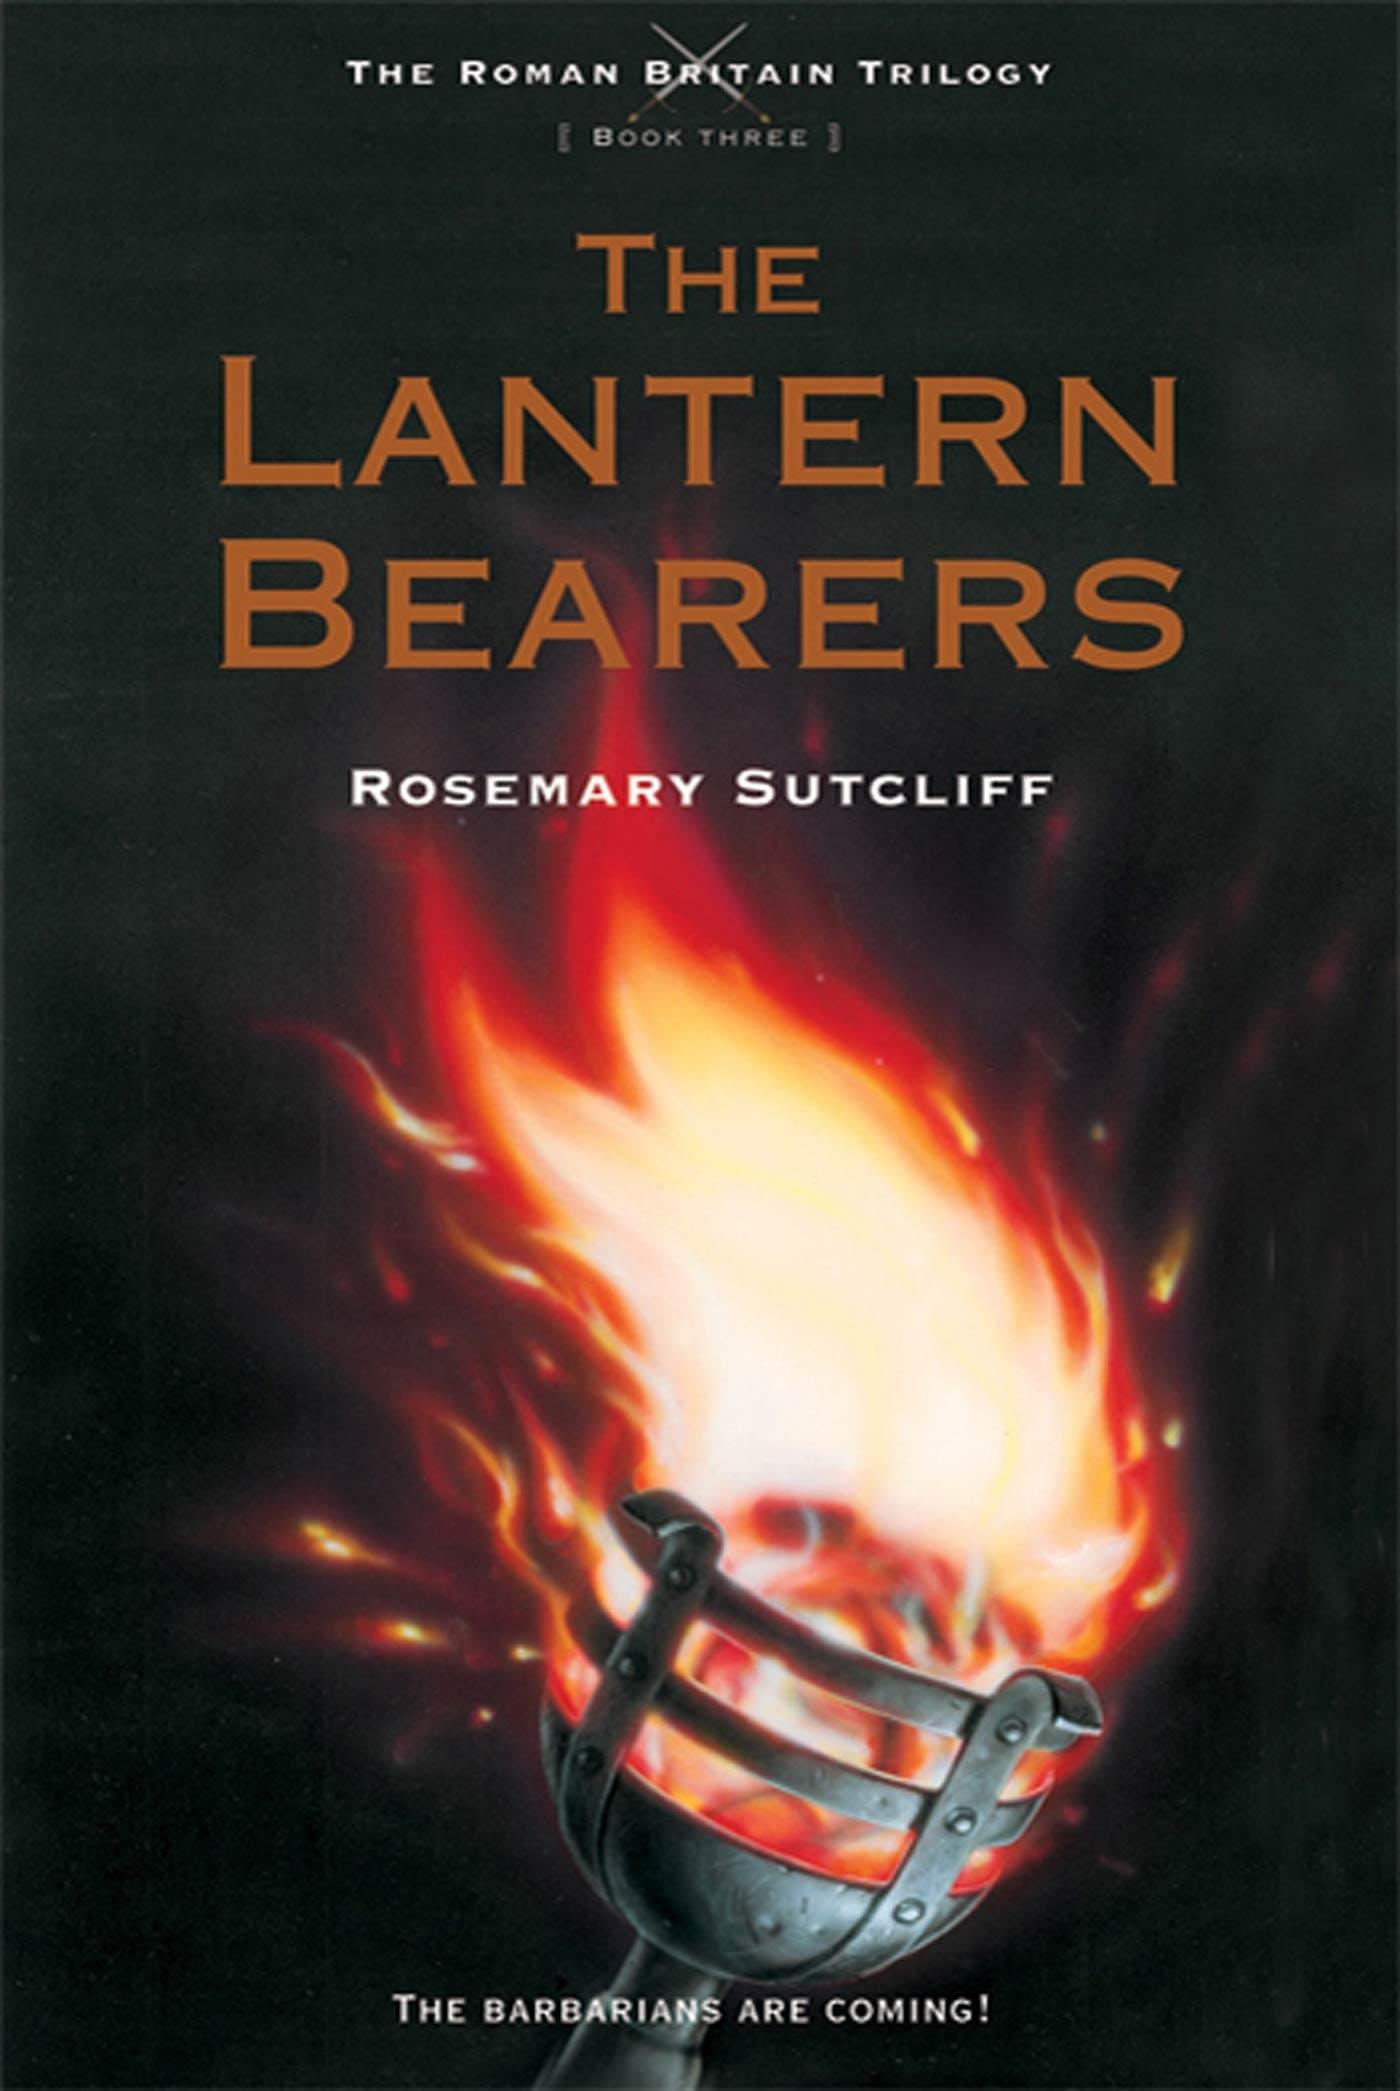 Image of The Lantern Bearers